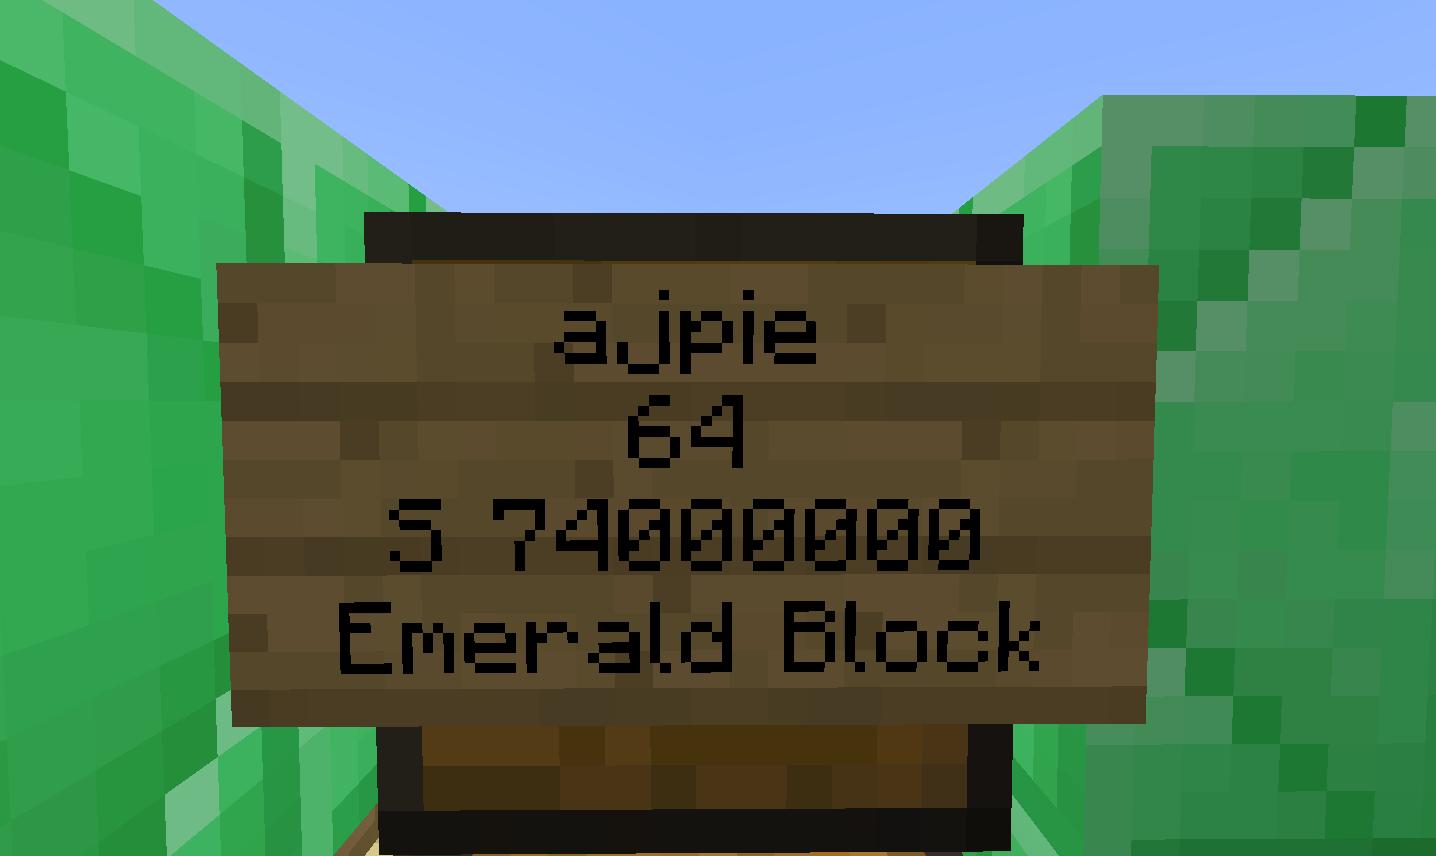 Minecraft Vs Herobrine Sonicexe